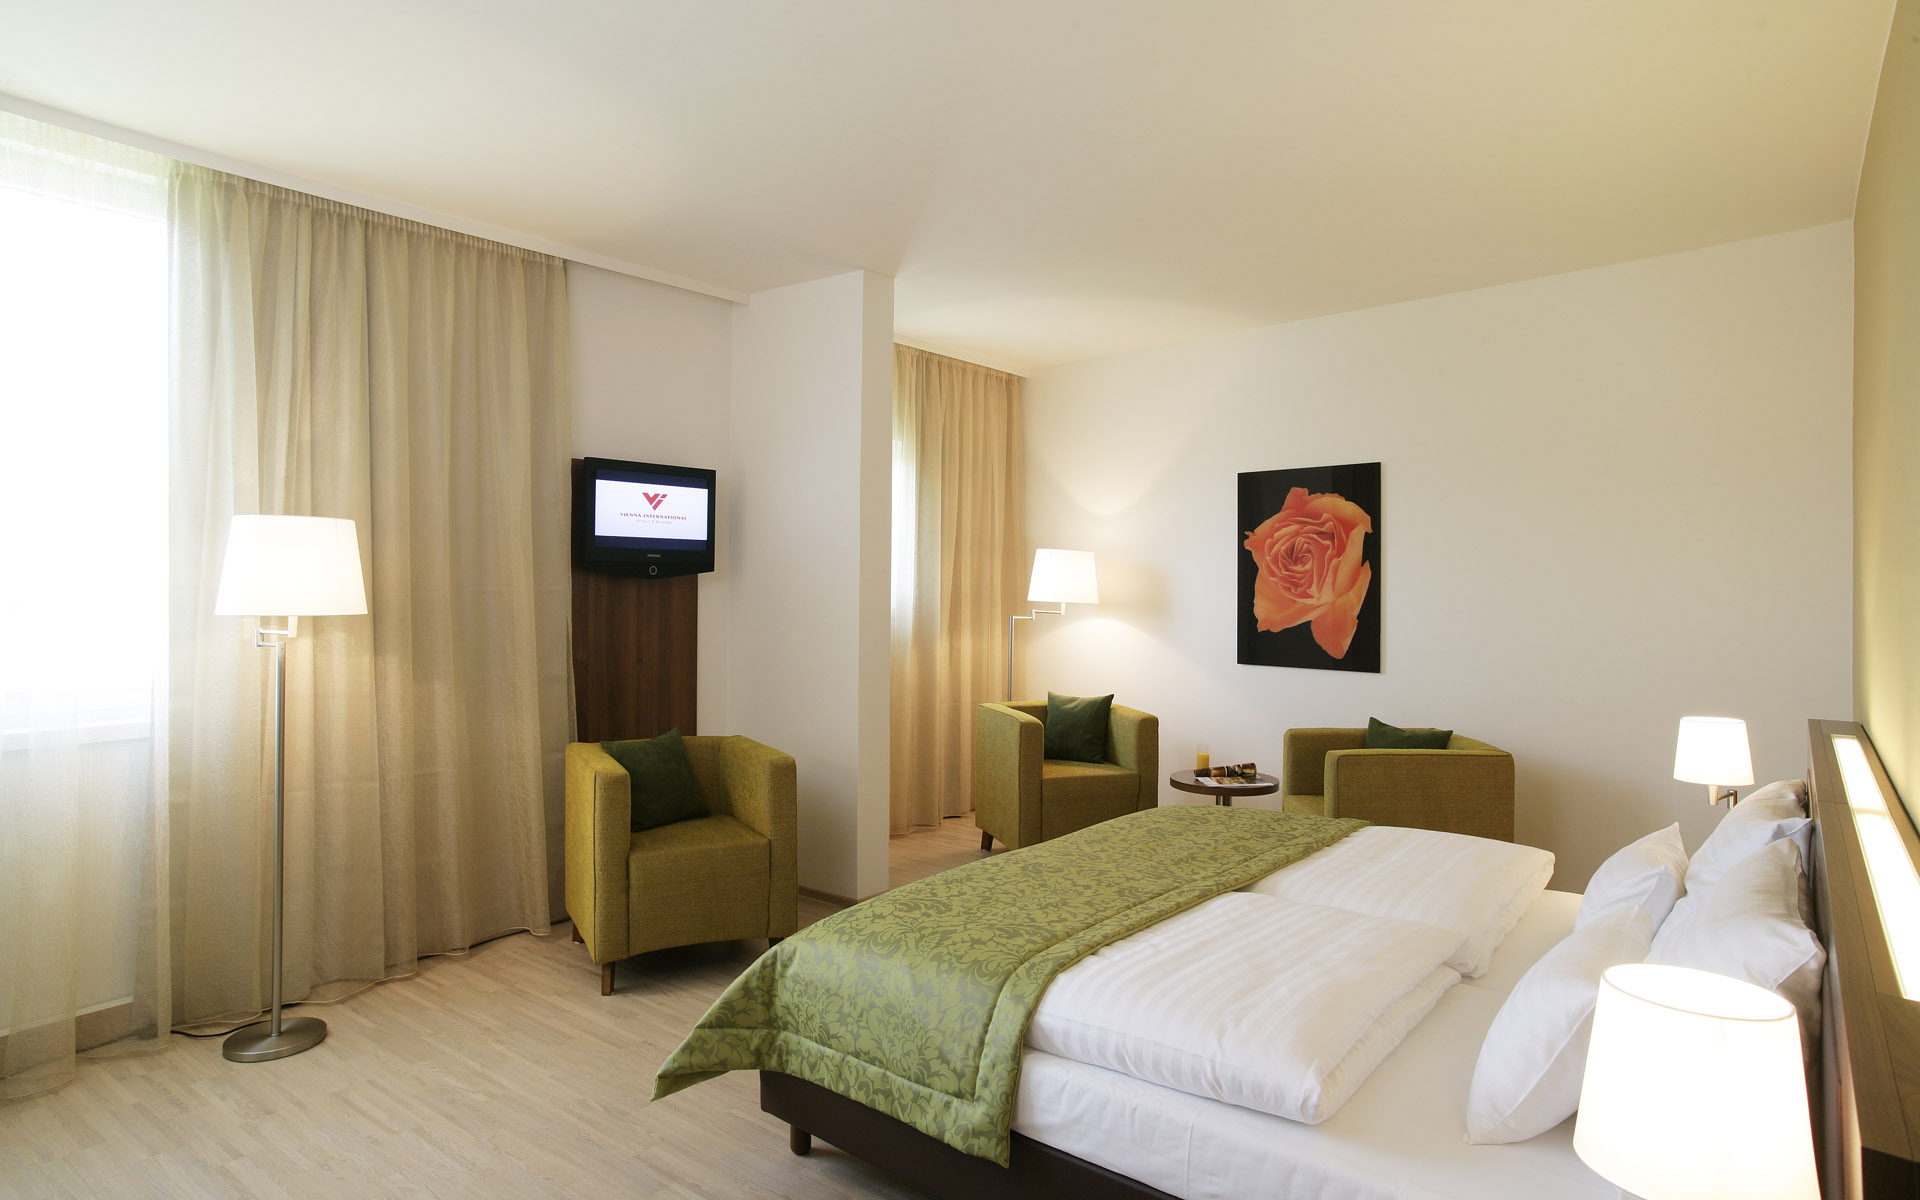 Уютная бежево-зеленая спальня